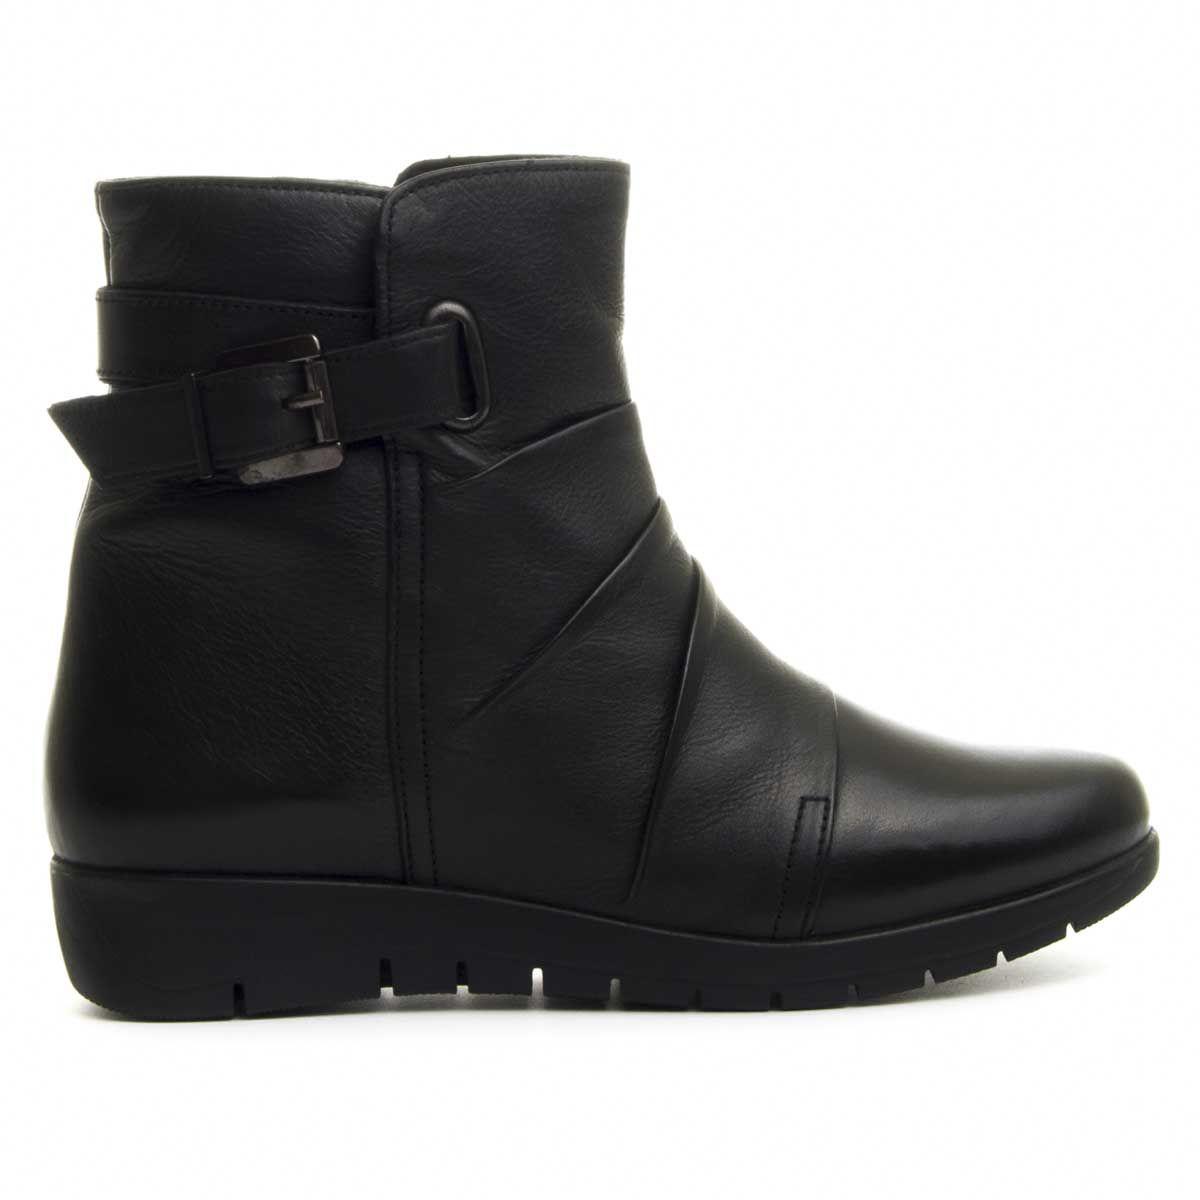 Purapiel Flat Ankle Boot in Black